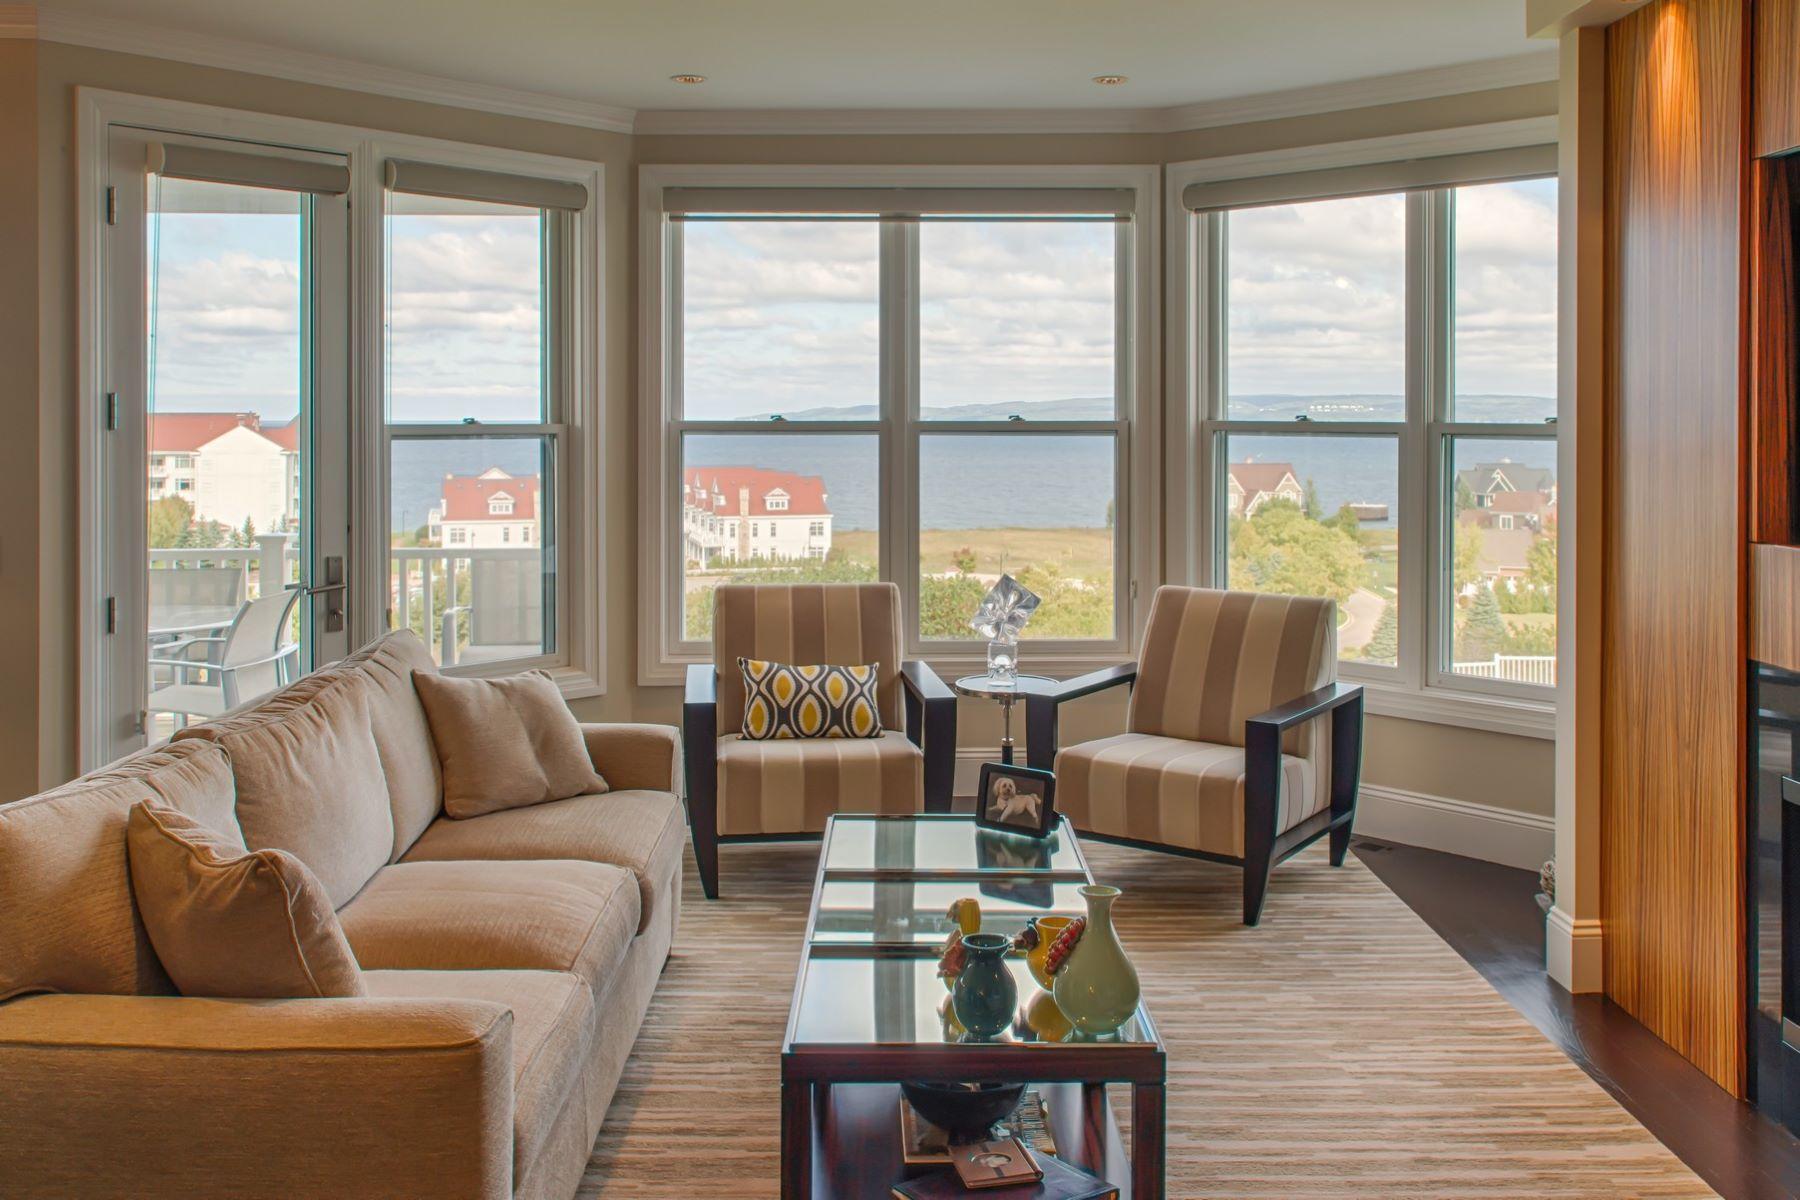 Condominium for Sale at Cliffs 13 and Garage 24 3560 Cliffs Drive Bay Harbor, Michigan, 49770 United States